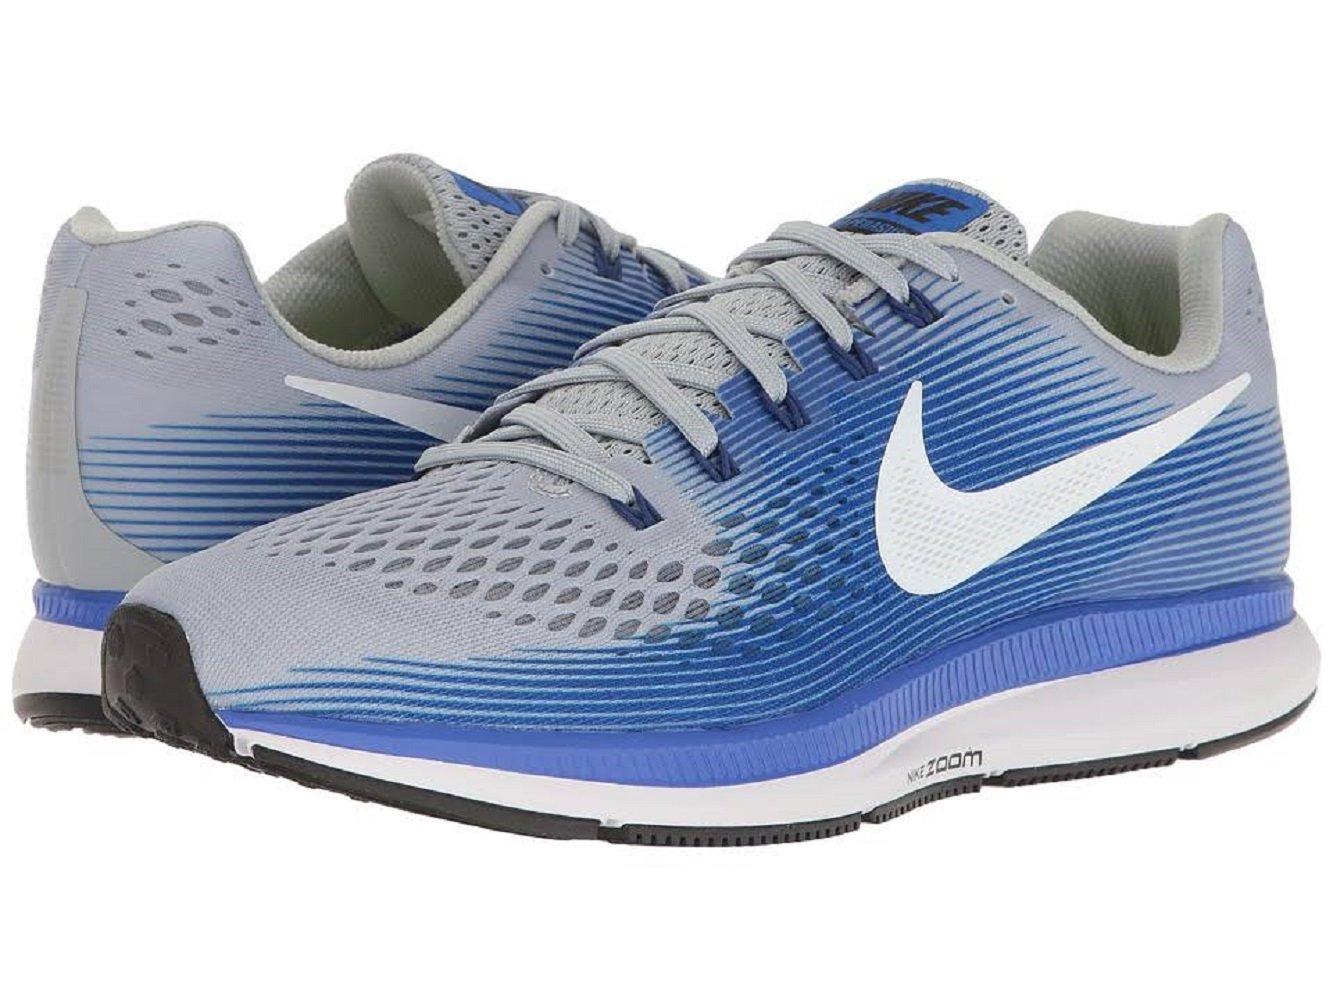 6f2692ed9c Galleon - NIKE Men's Air Zoom Pegasus 34 Running Shoes (8.5, Grey/Blue-EW)